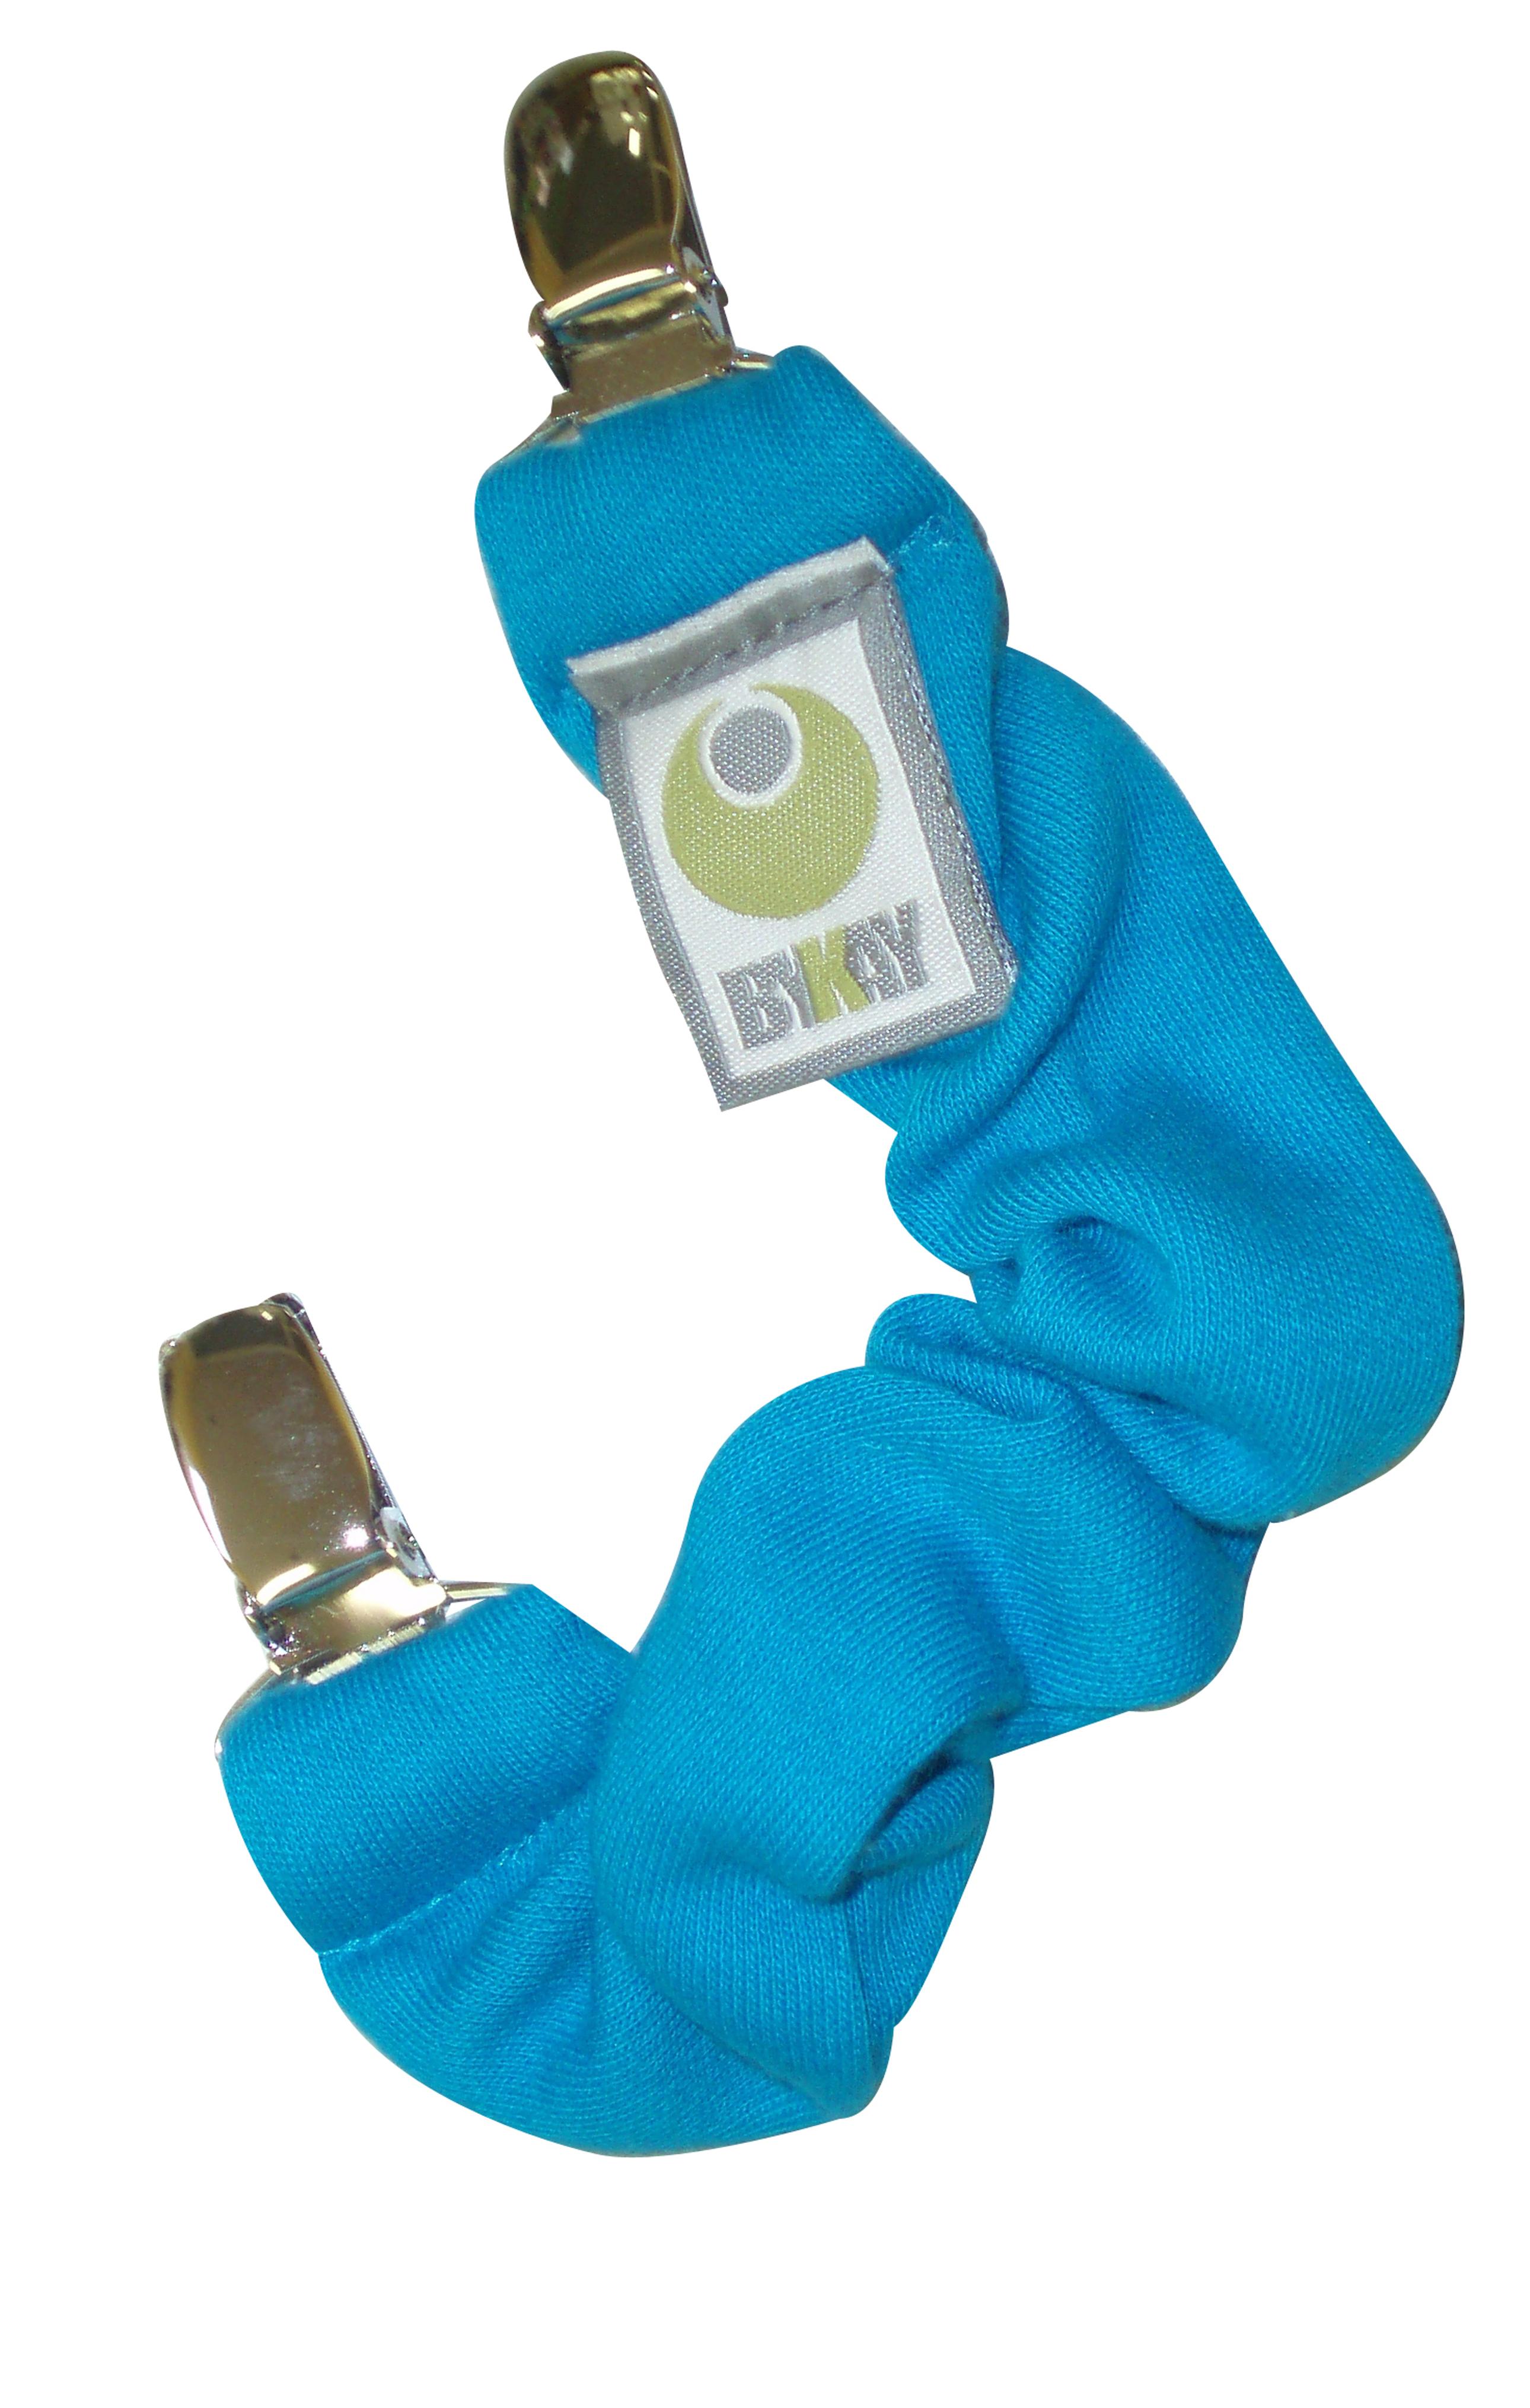 Knuffel- Speenkoord - Turquoise